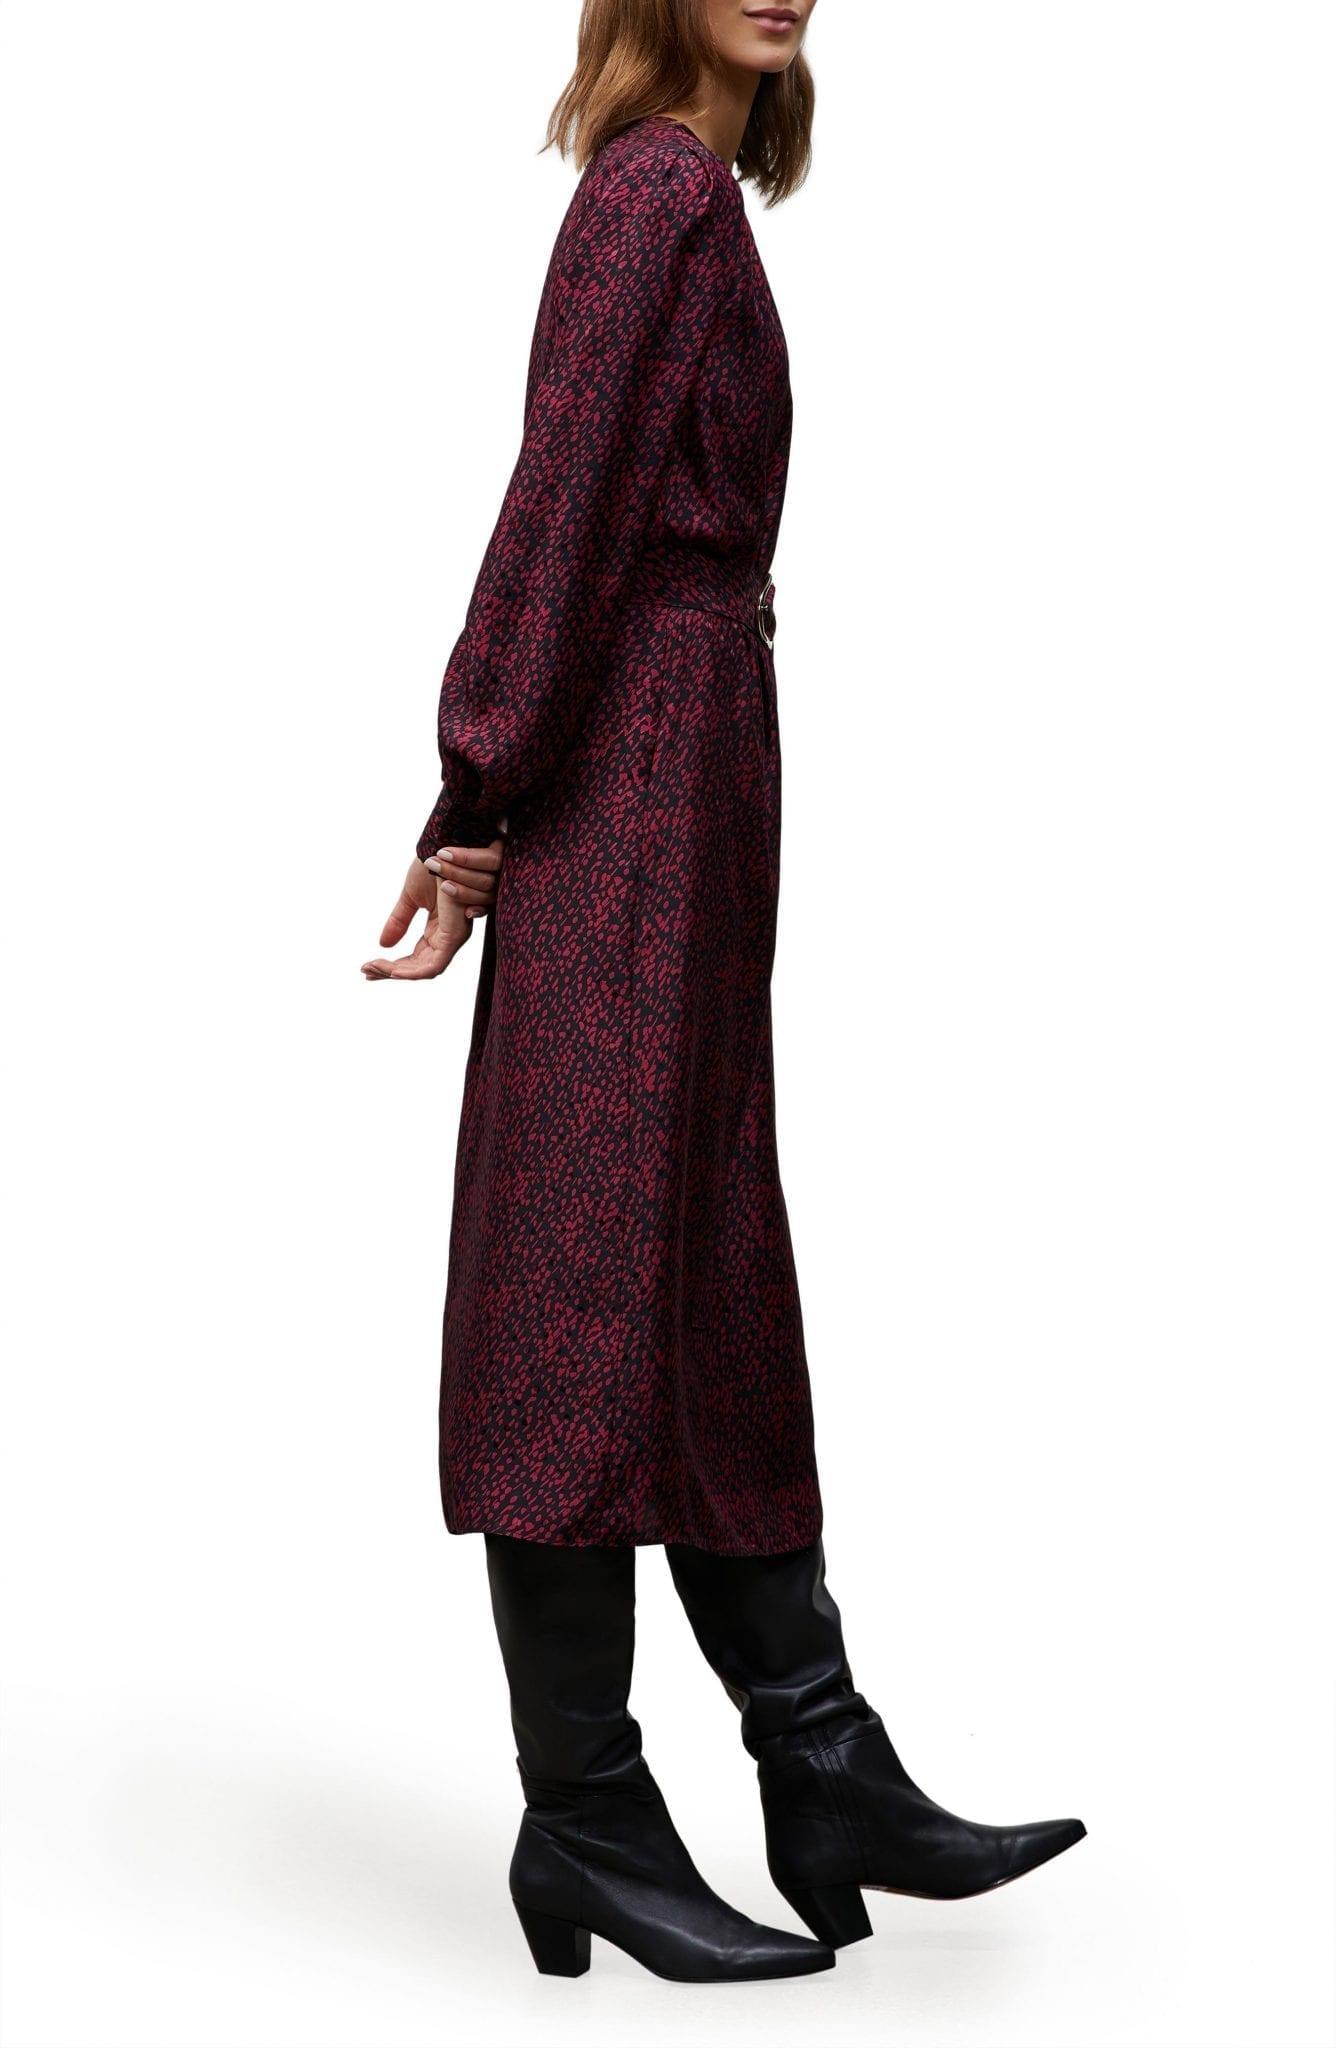 LAFAYETTE 148 NEW YORK Iver Falling Dot Print Long Sleeve Silk Midi Dress